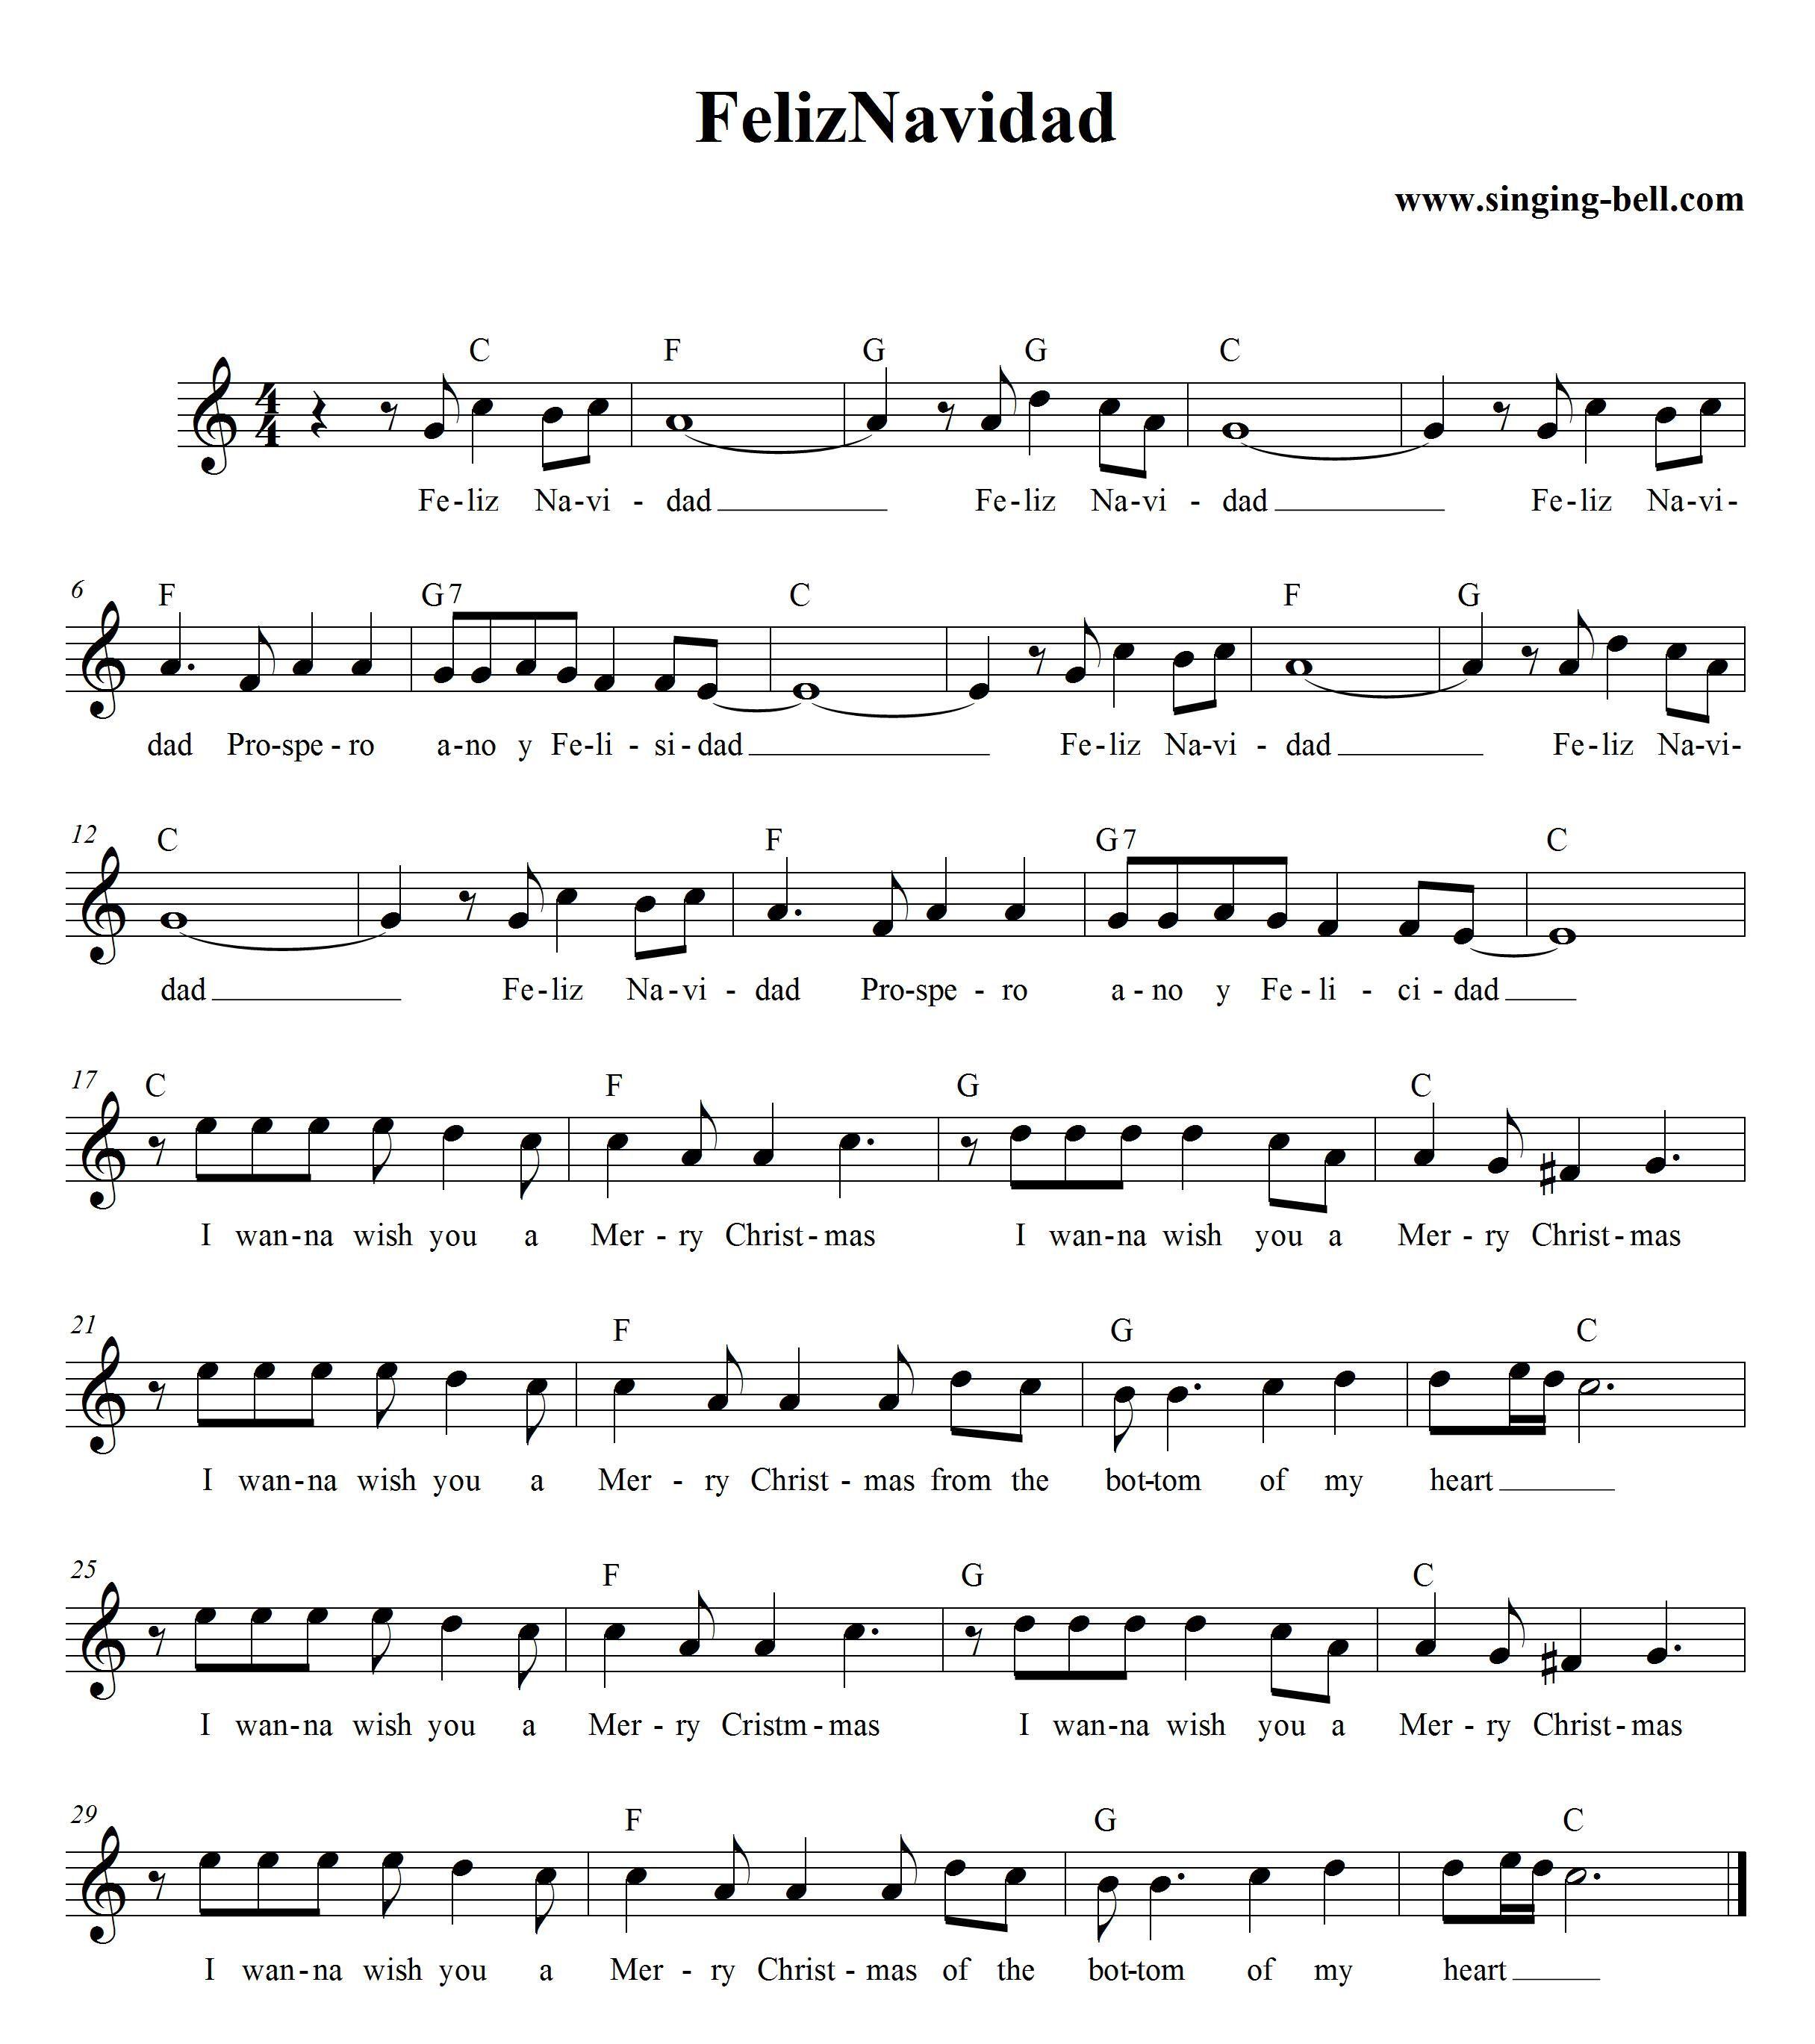 feliz navidad clarinet sheet music christmas sheet music saxophone sheet music feliz navidad clarinet sheet music